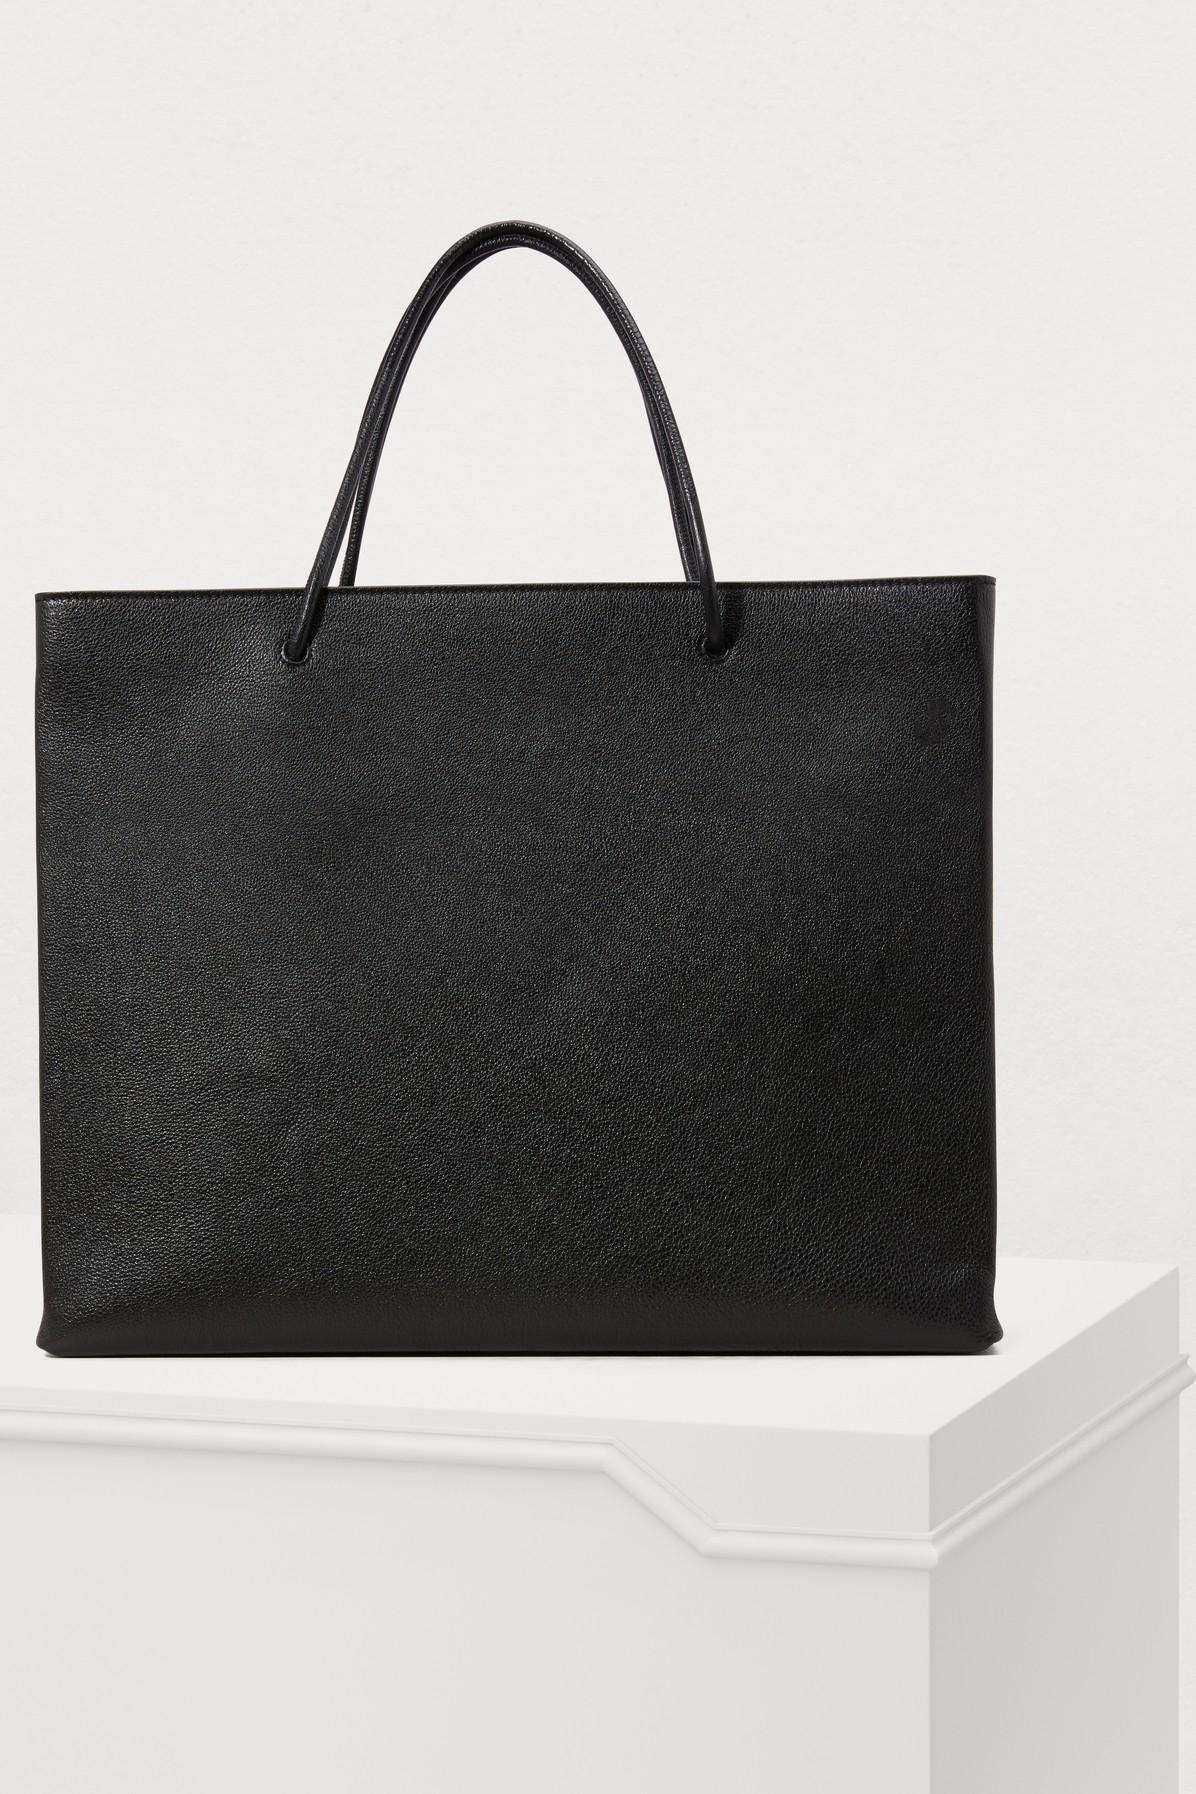 Balenciaga Denim Medium Tote Bag in Black